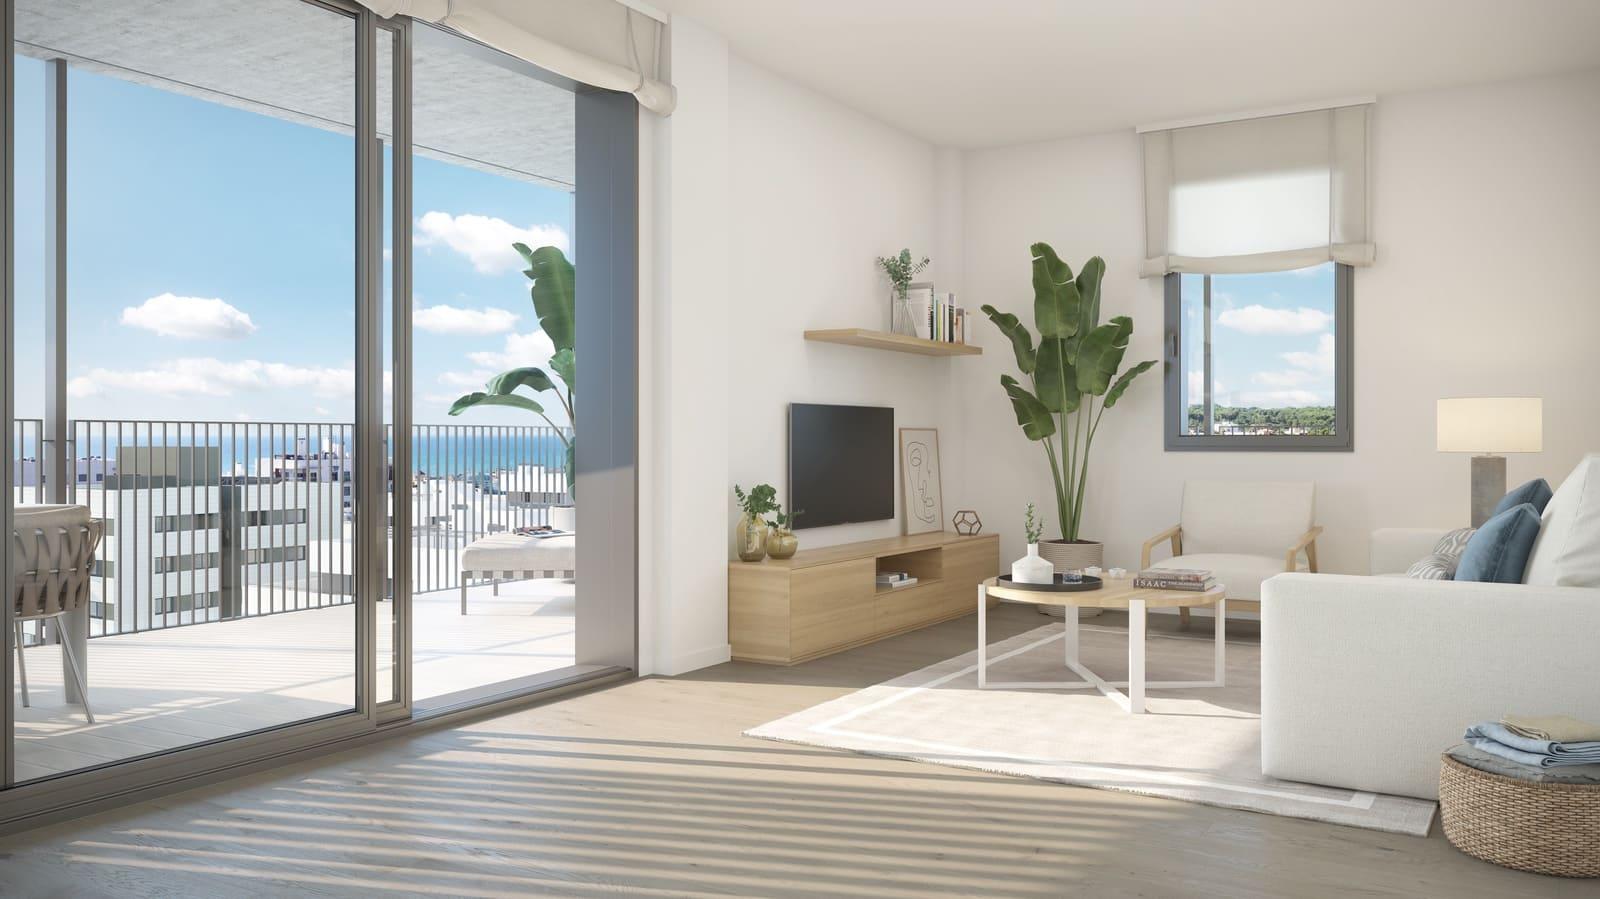 2 bedroom Apartment for sale in Vilanova i la Geltru with pool - € 234,000 (Ref: 5931493)